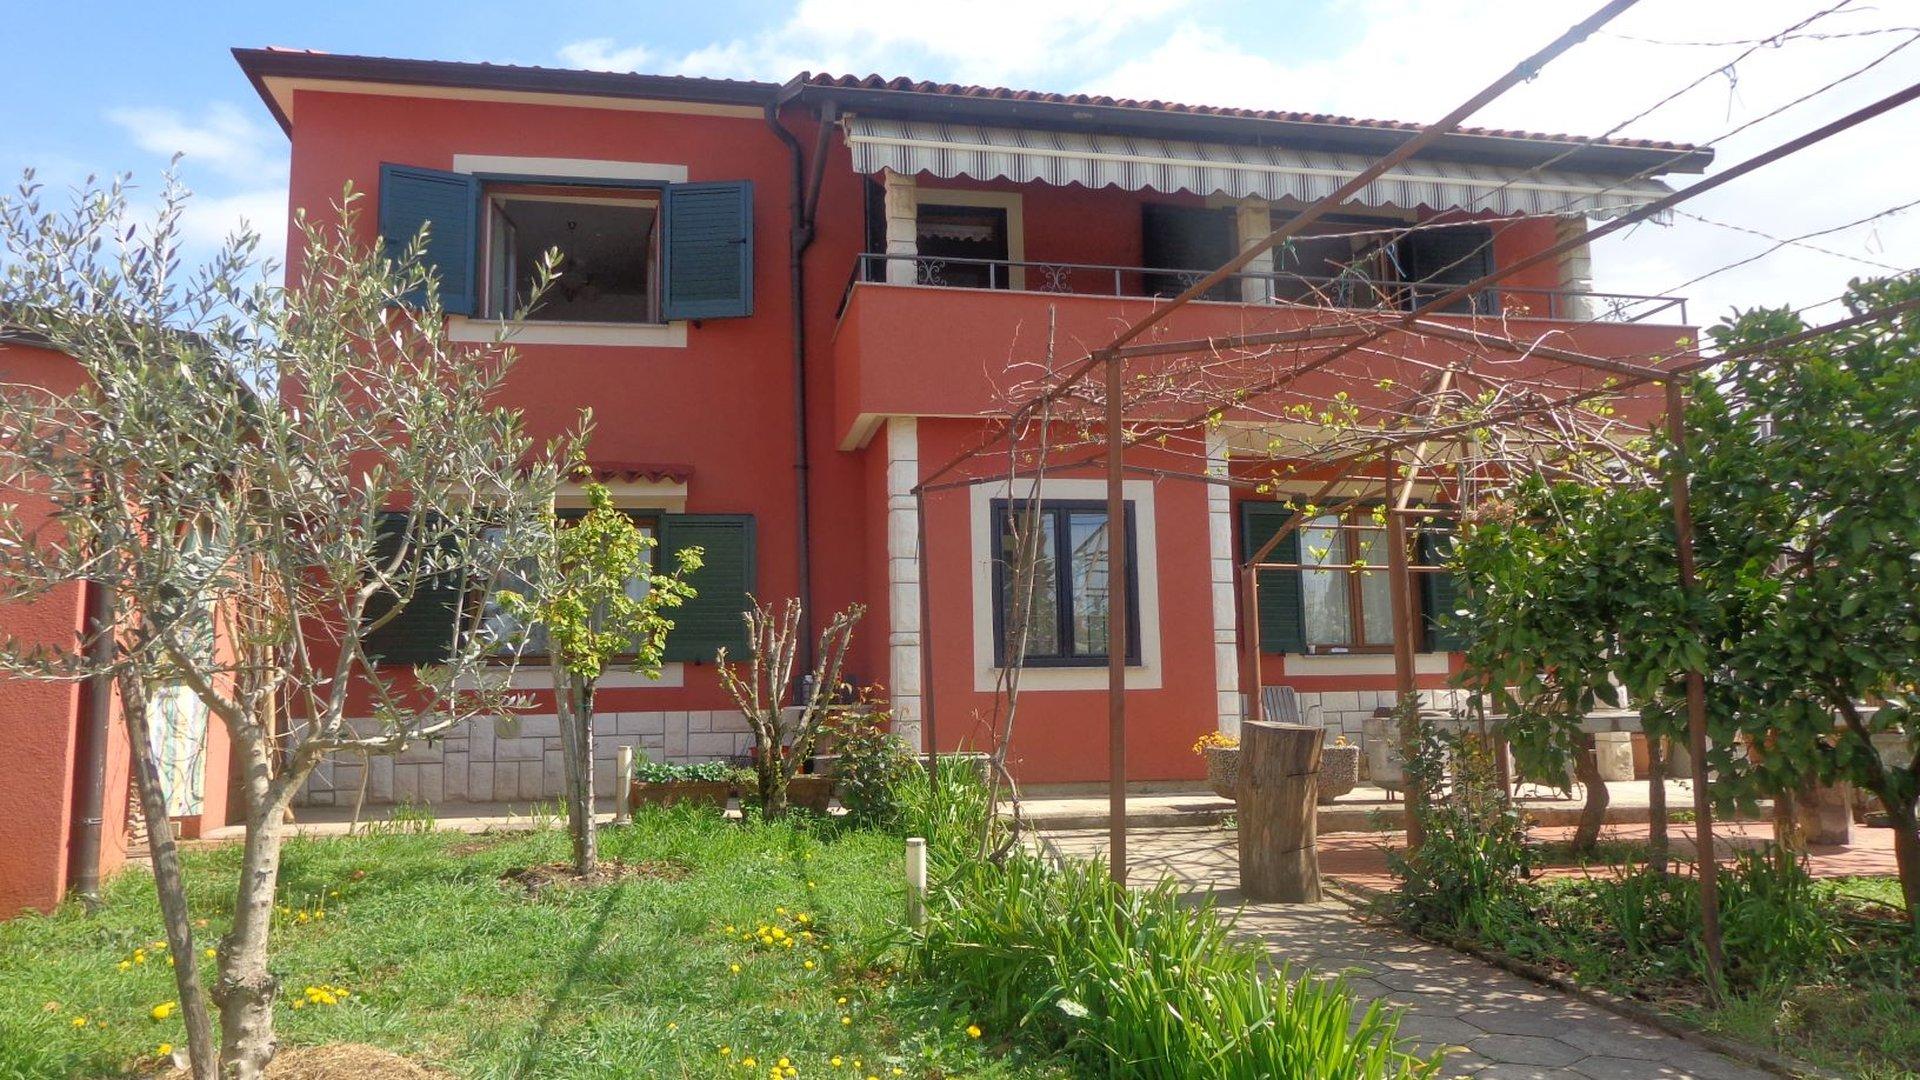 Haus in Strandnähe mit offenem Meerblick in exzellenter Lage in Istrien